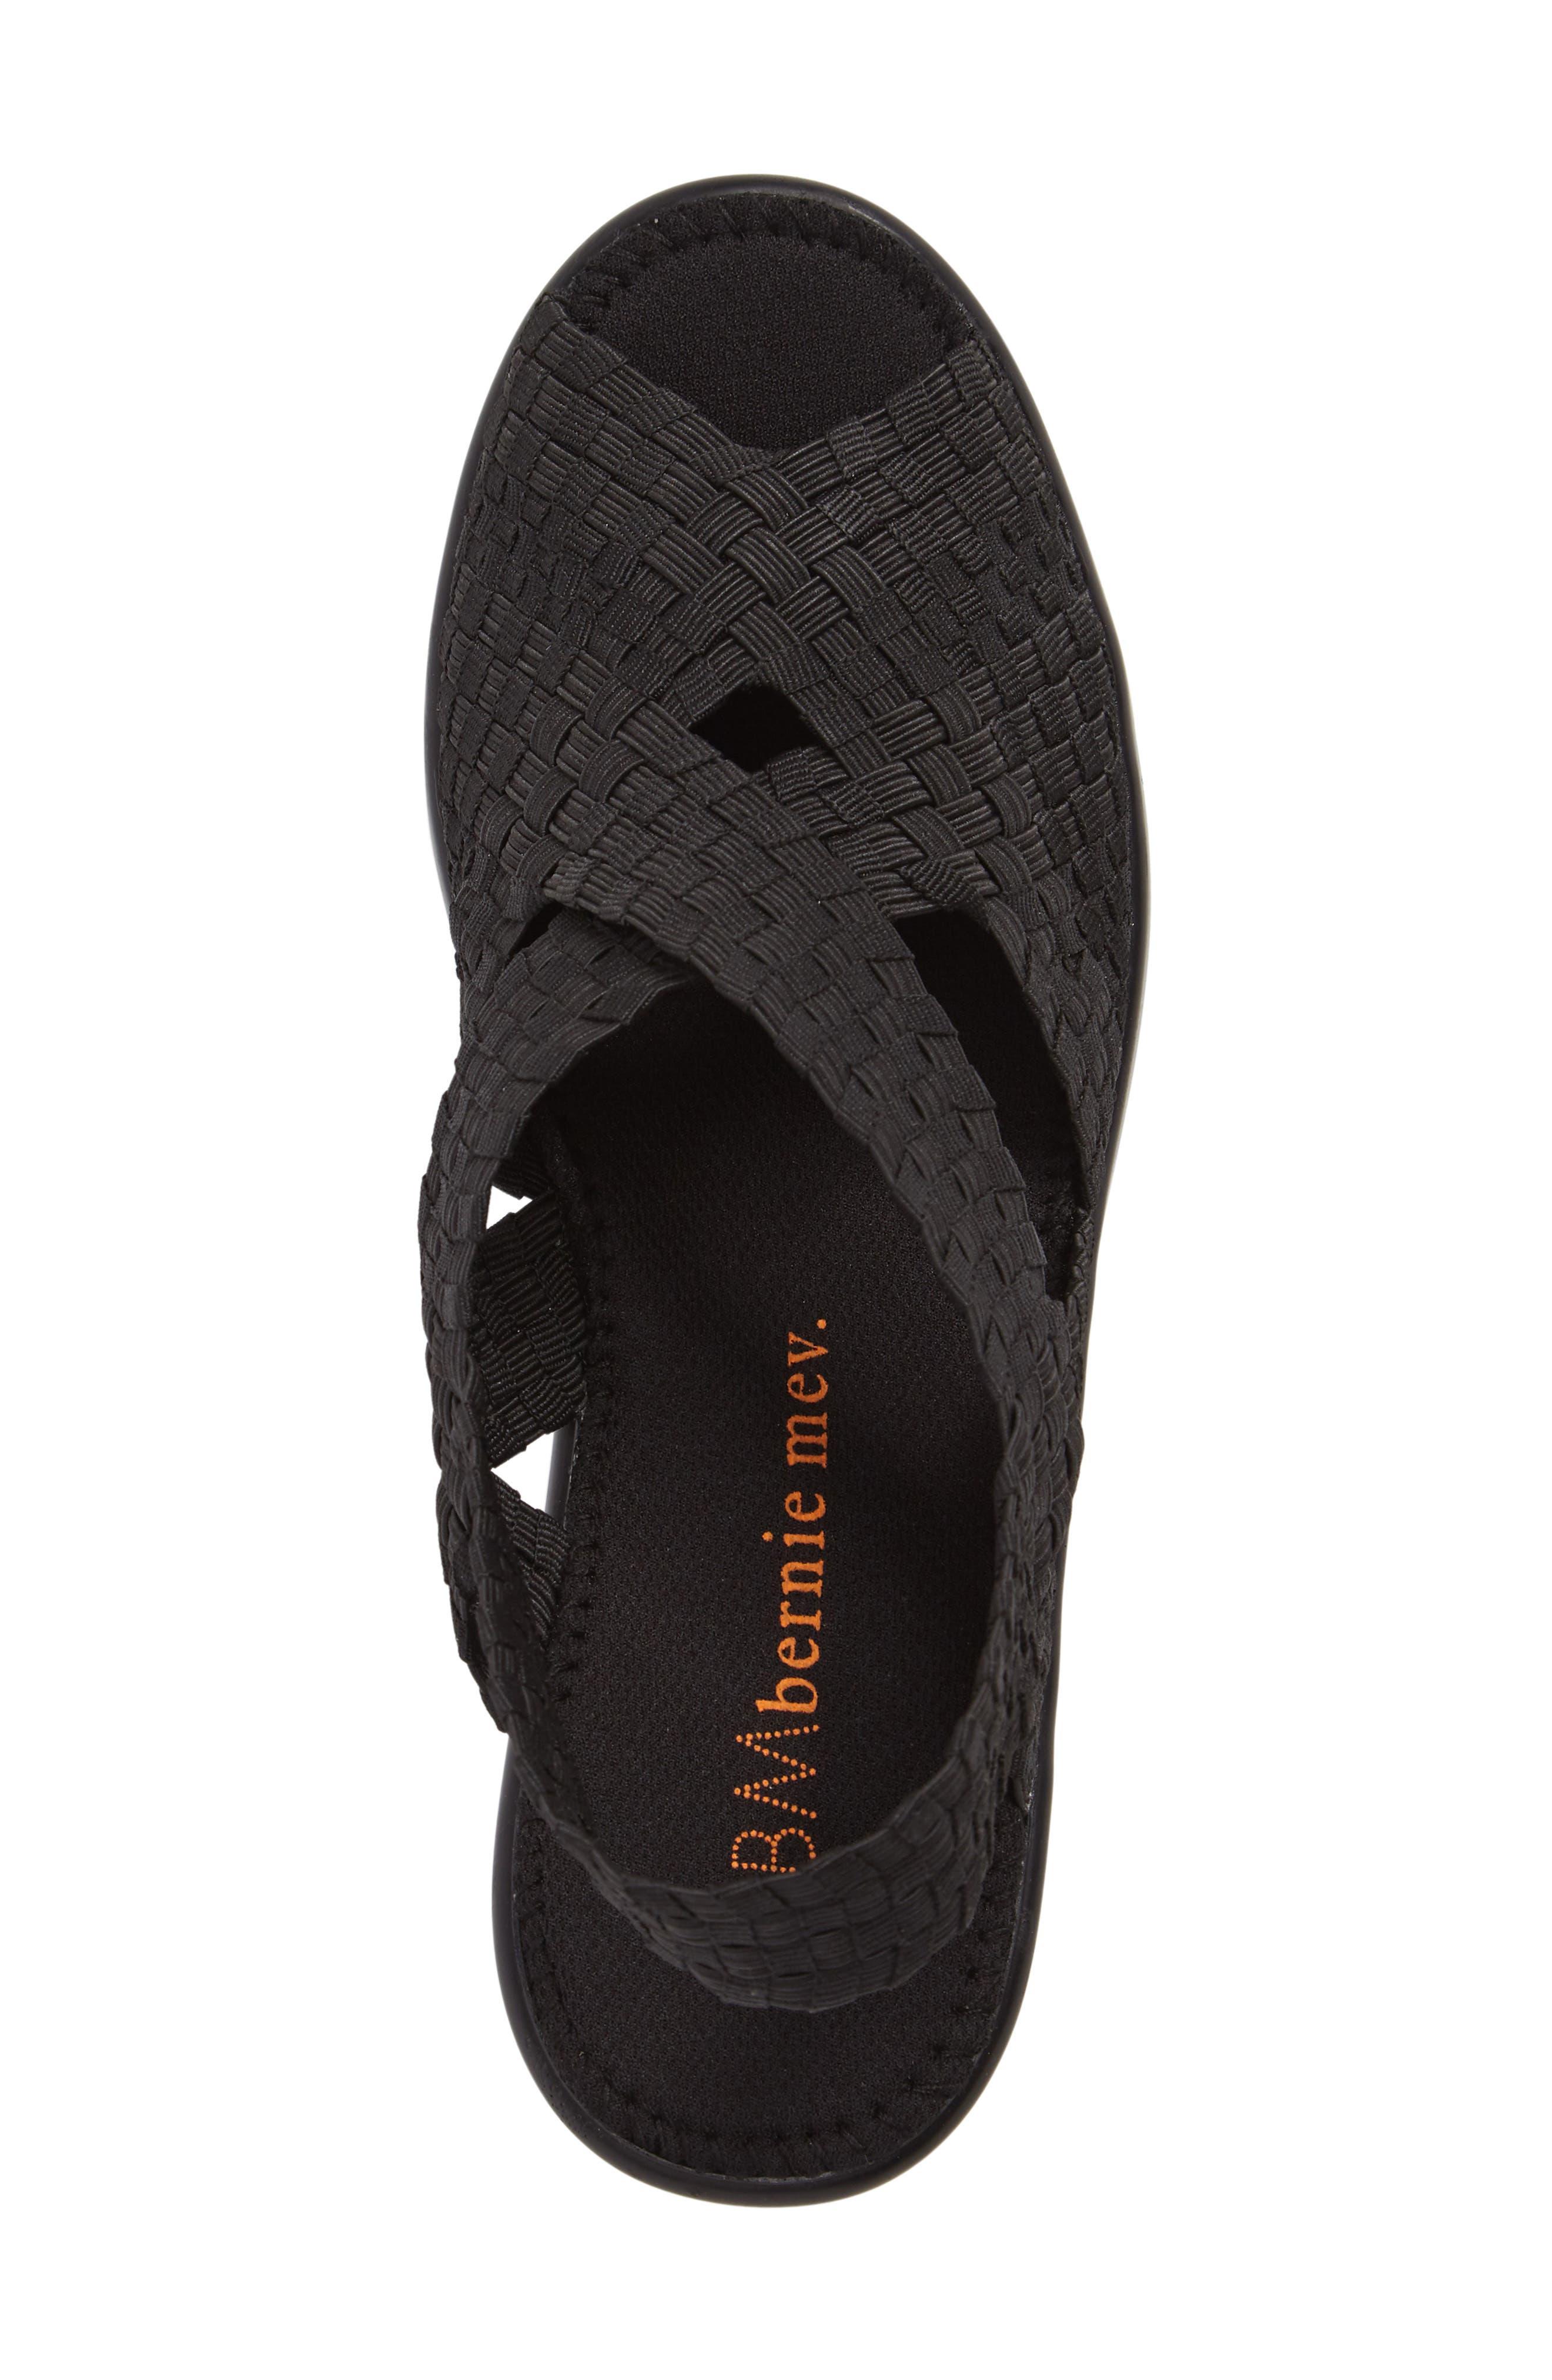 Fresh Brighten Sandal,                             Alternate thumbnail 5, color,                             BLACK FABRIC